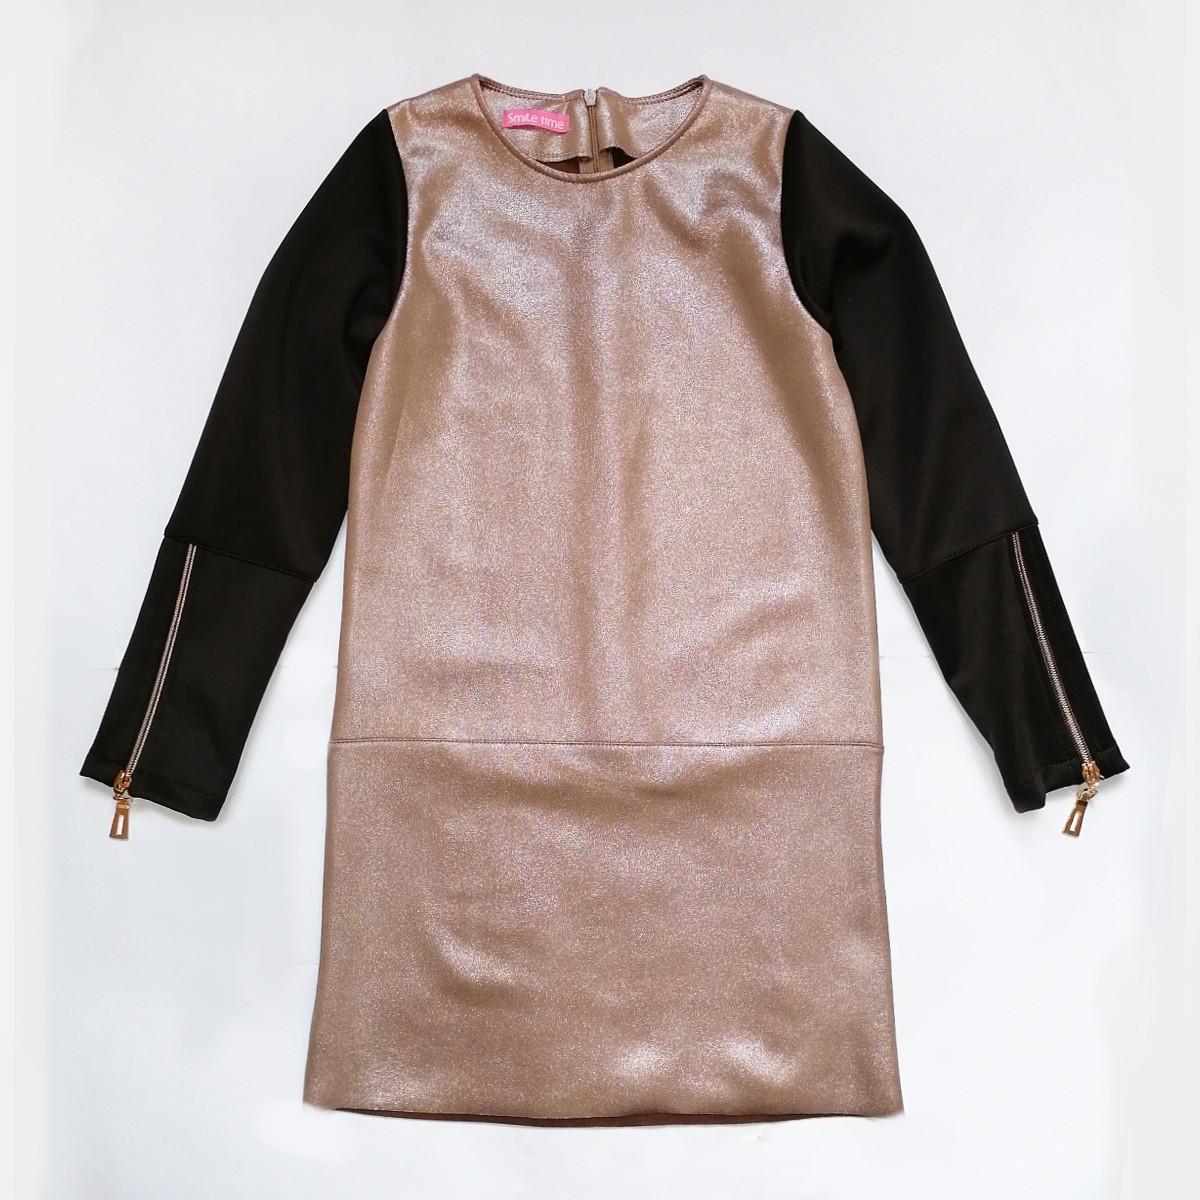 Платье нарядное р.128,134,140,146 SmileTime для девочки Grace, бежевое